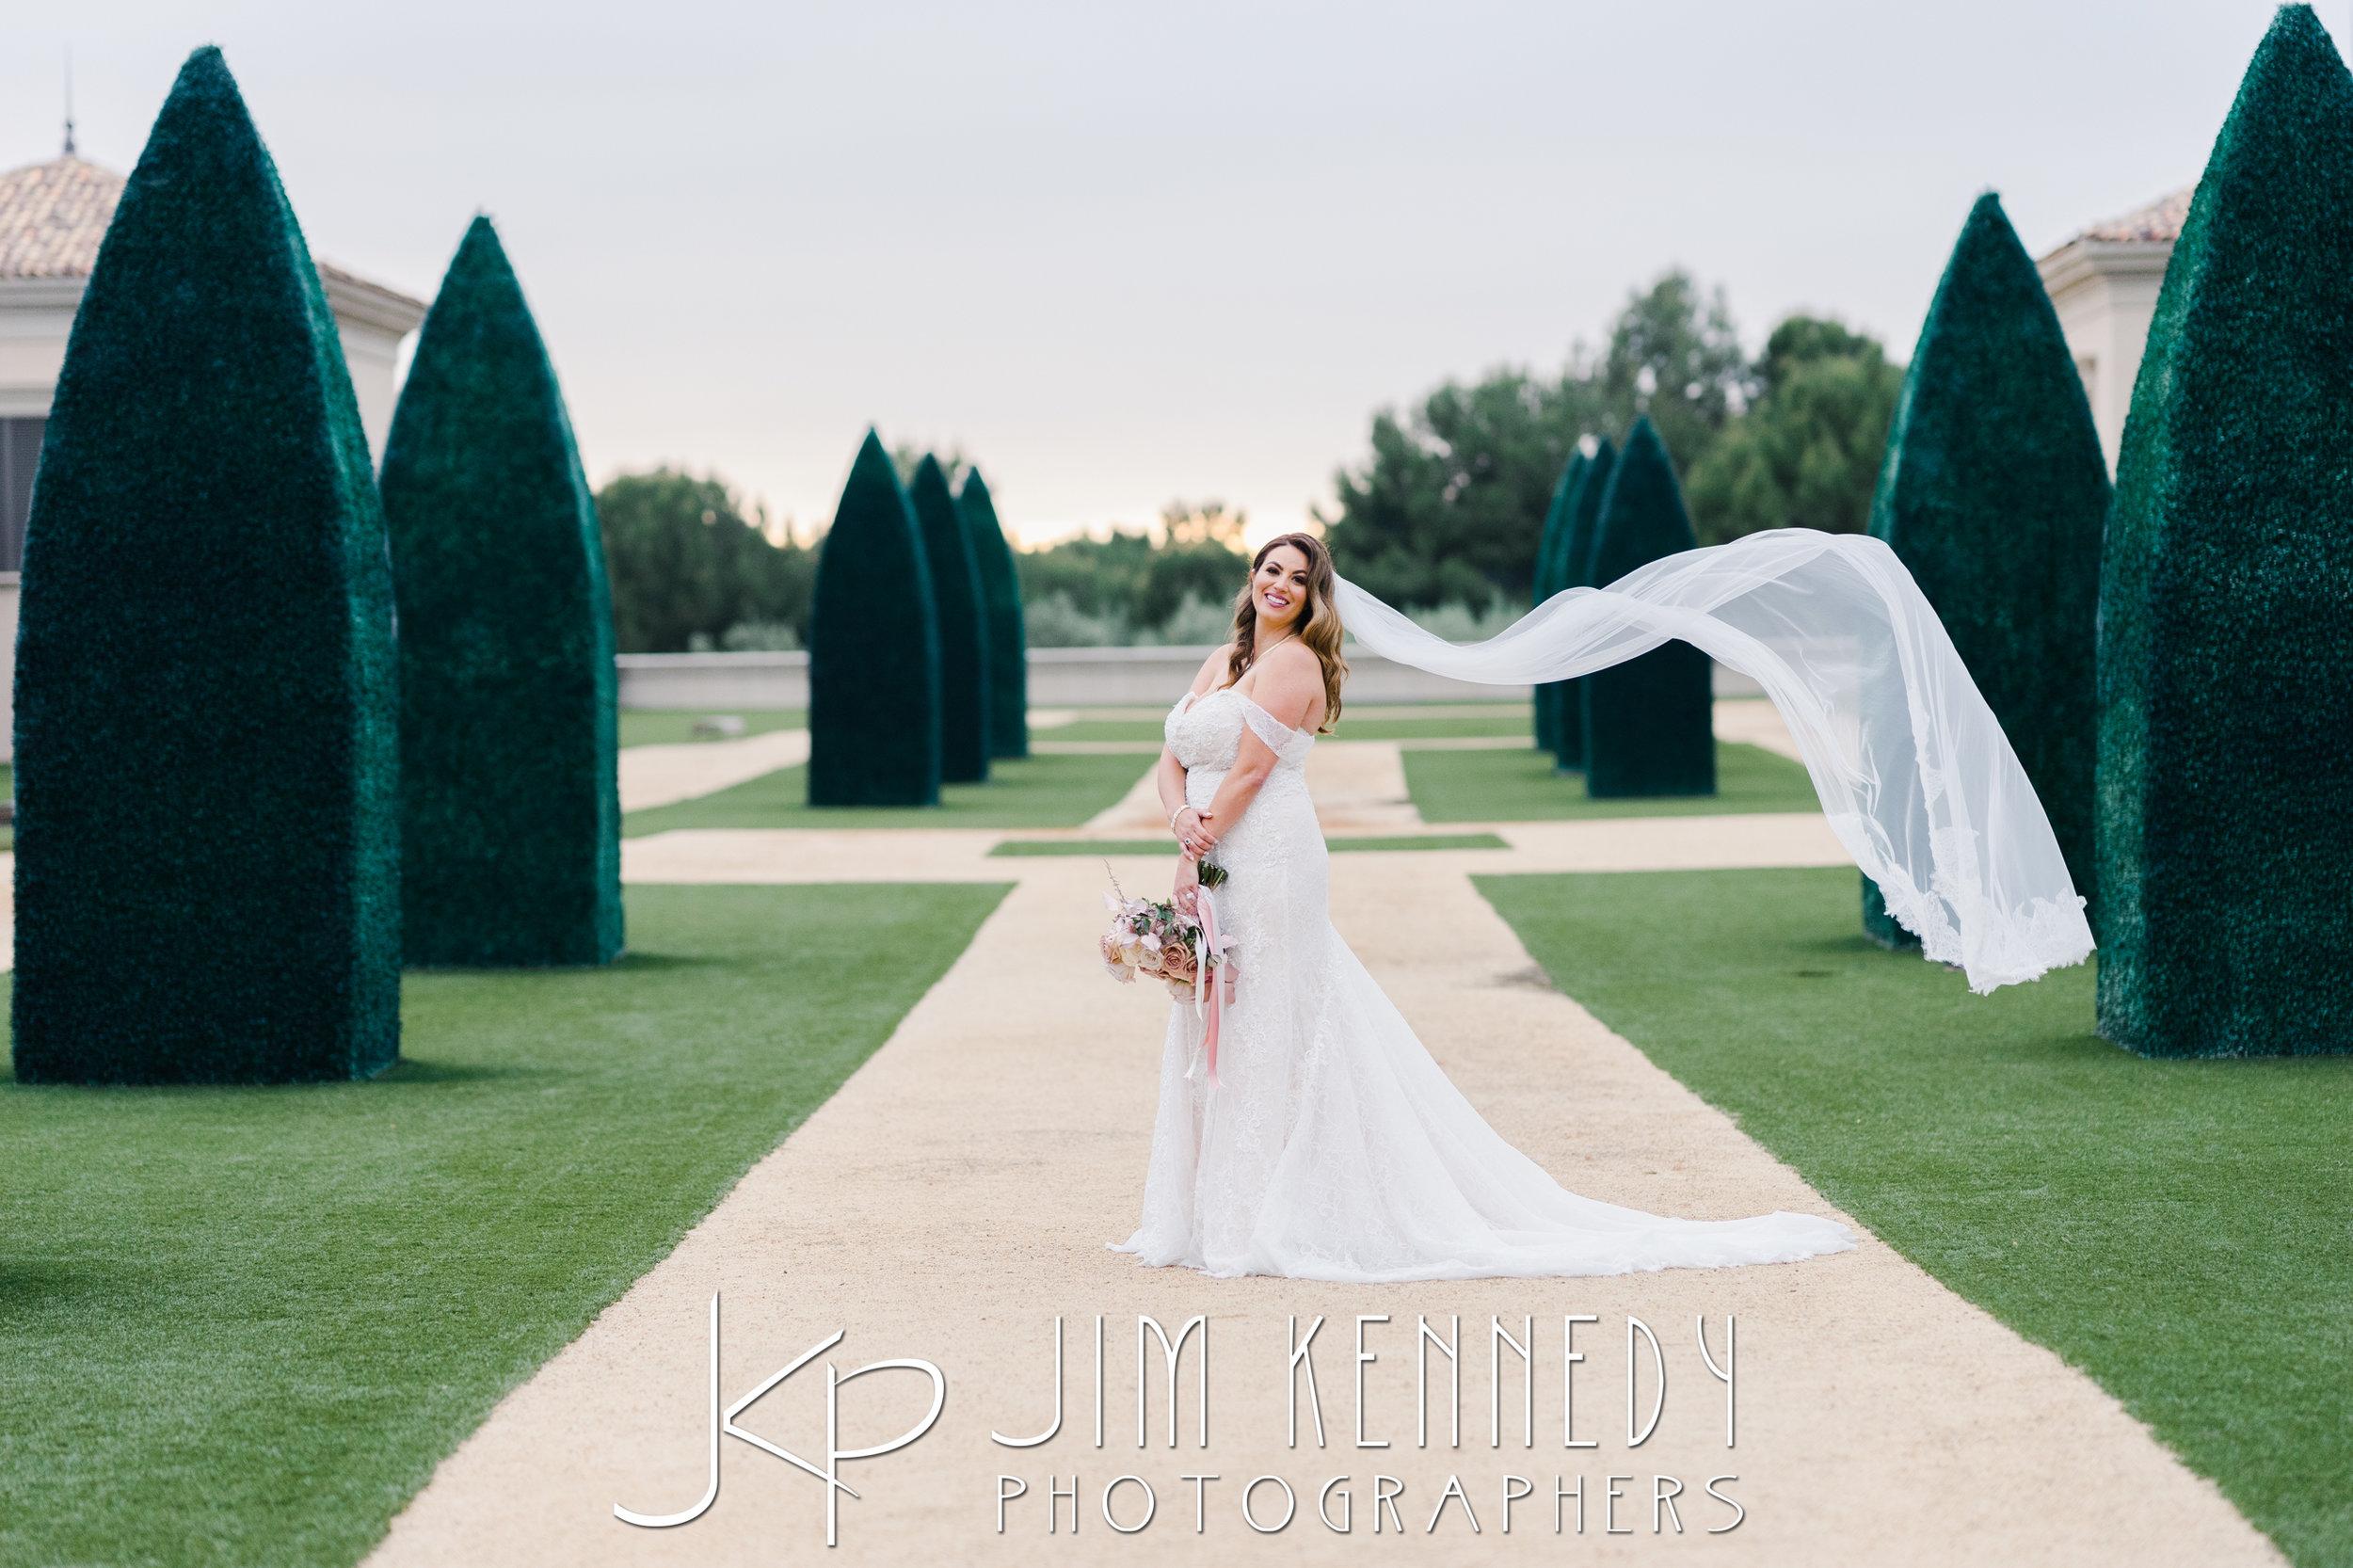 pelican-hill-wedding-jim-kenedy-photographers_0180.JPG